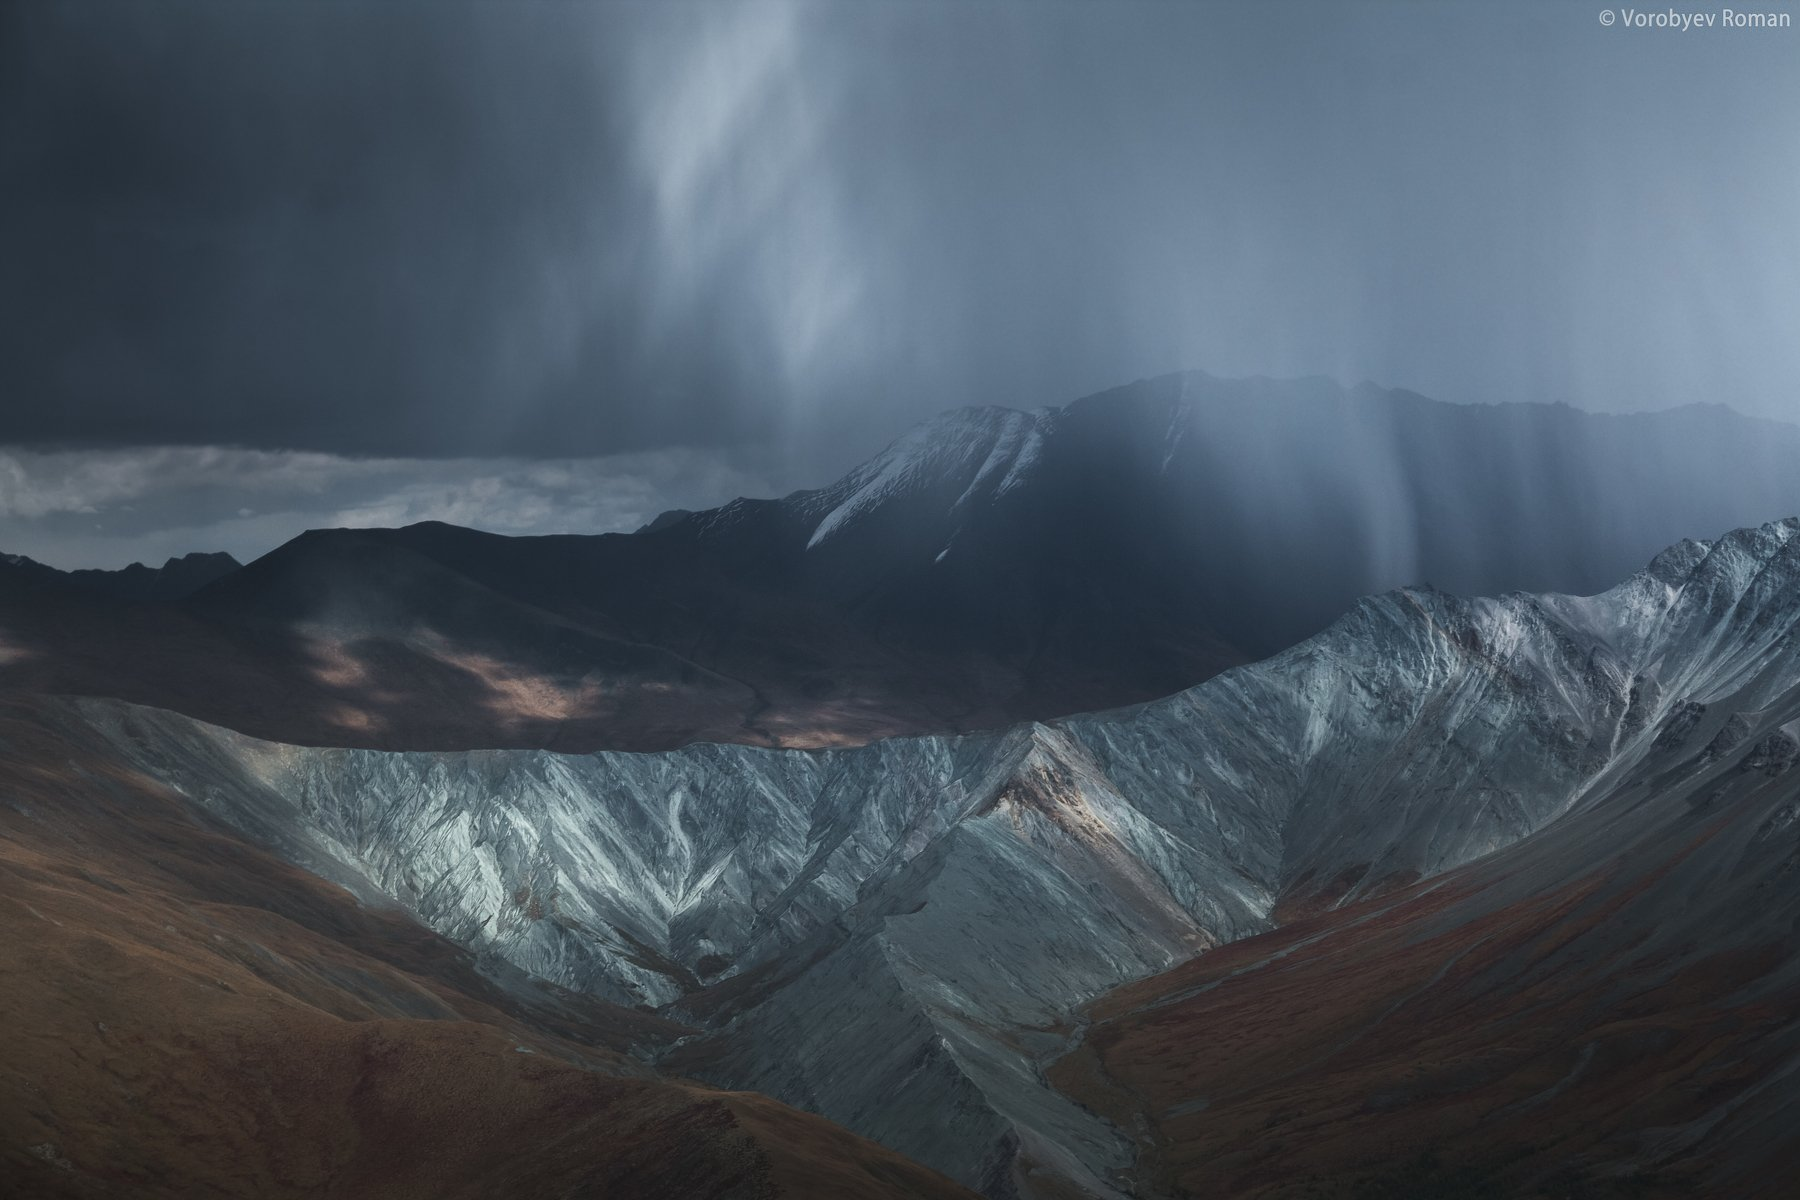 алтай, горы, снег, горный алтай, осень,, Roman Vorobyev